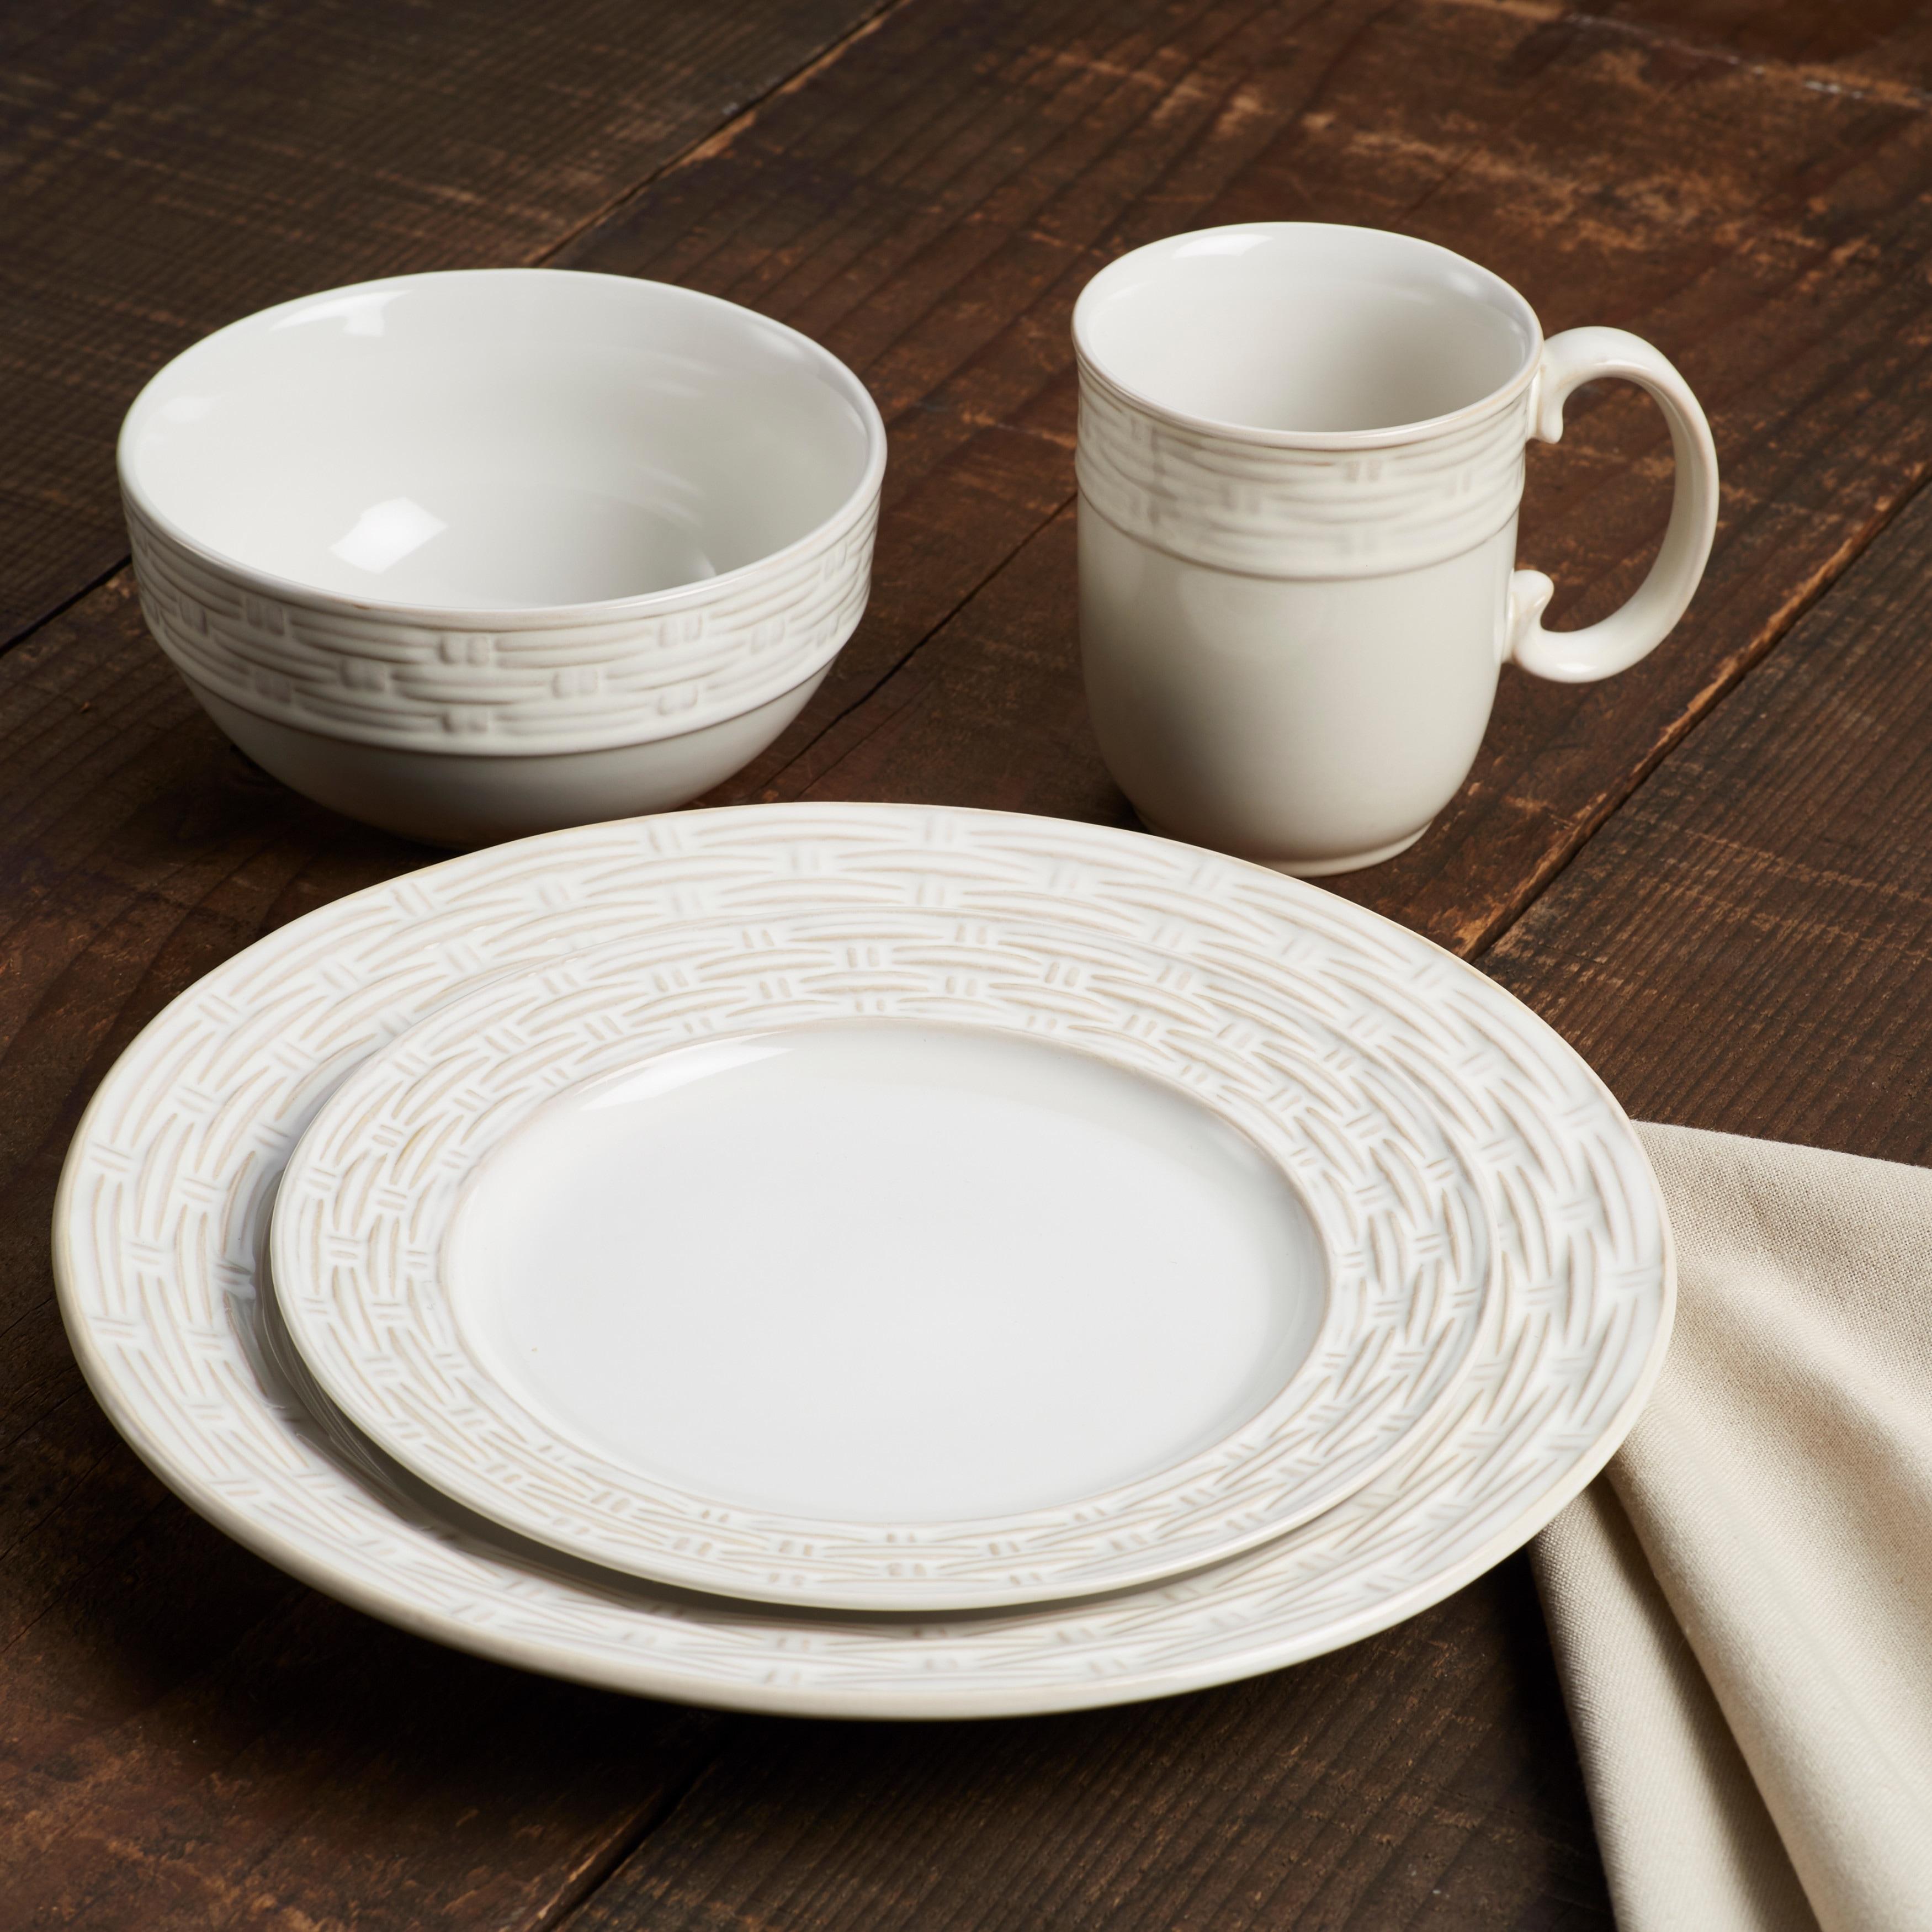 Shop Paula Deen Vineyard Basket Stoneware Dinnerware Set - On Sale - Free Shipping Today - Overstock.com - 17666591 & Shop Paula Deen Vineyard Basket Stoneware Dinnerware Set - On Sale ...